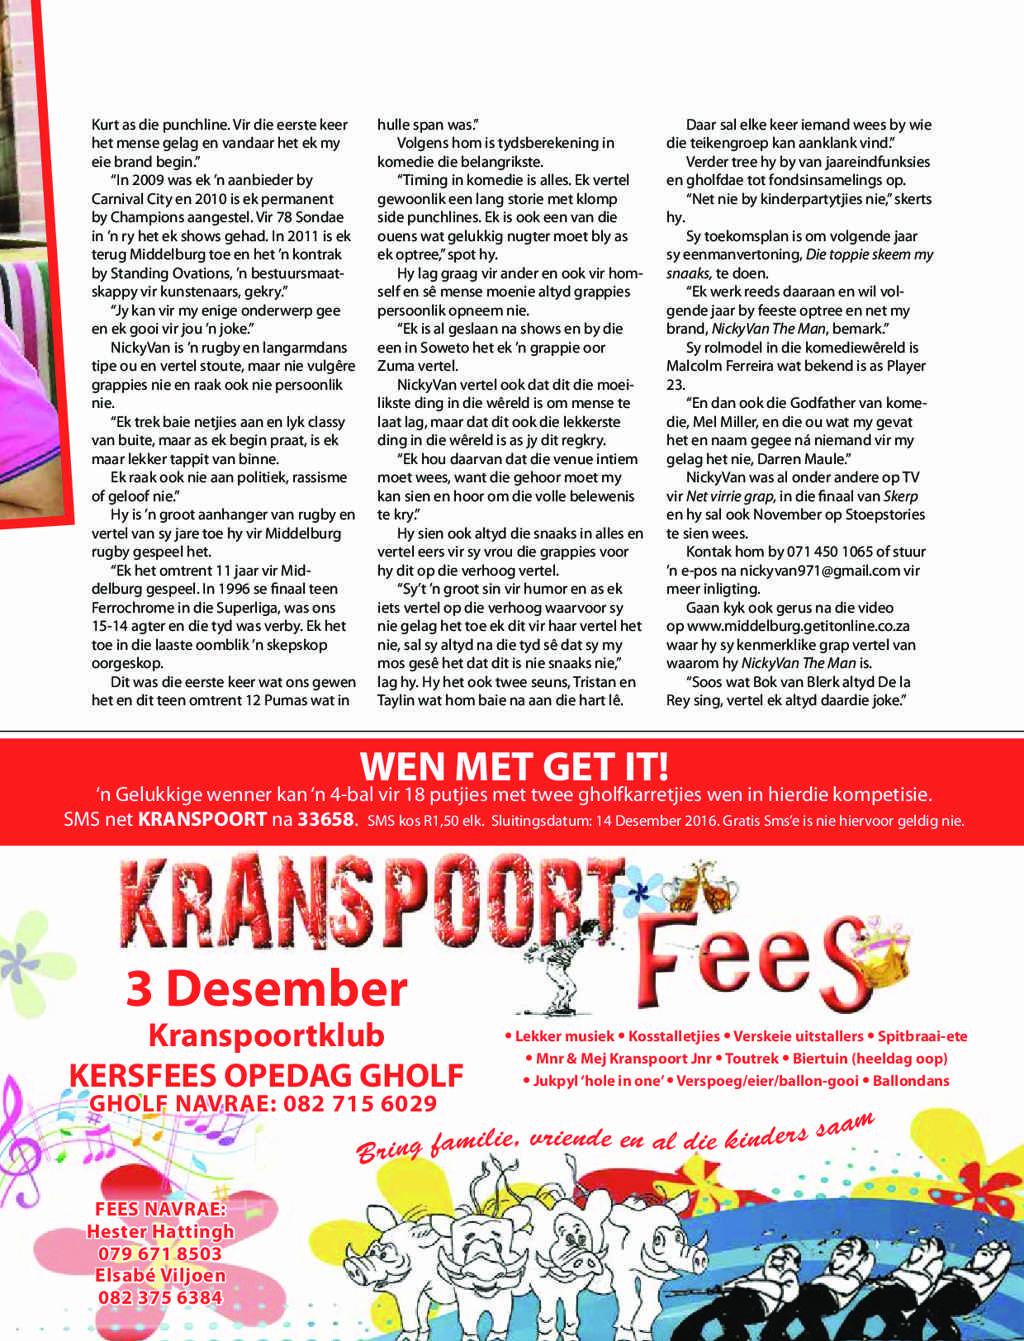 get-it-middelburg-december-2016-epapers-page-27